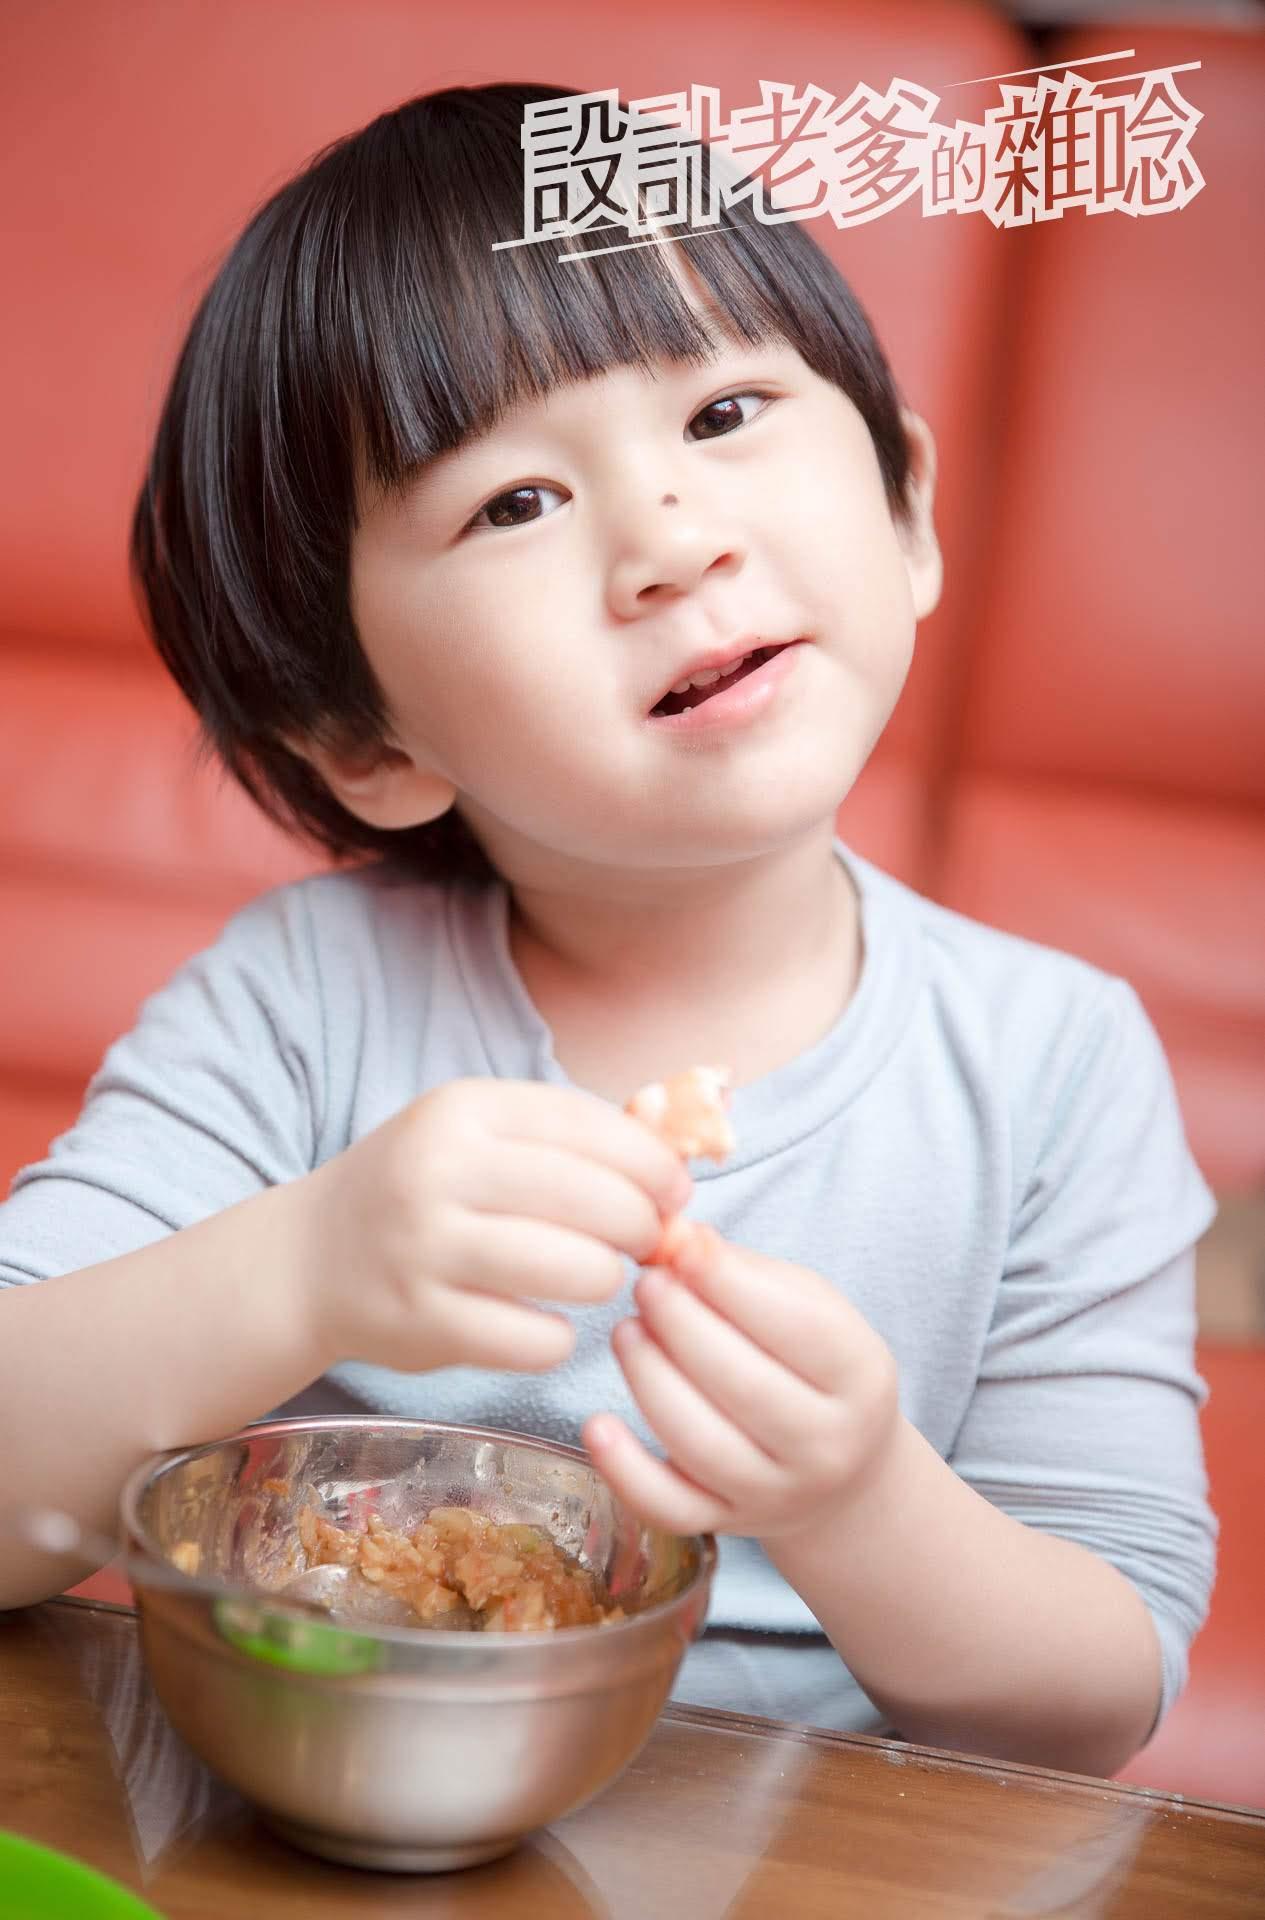 Mr.Sege 硒鍺先生 富硒鍺鋅有機白米/有機糙米...拿到有趣的米就來煮幾道健康的米飯料理吧!